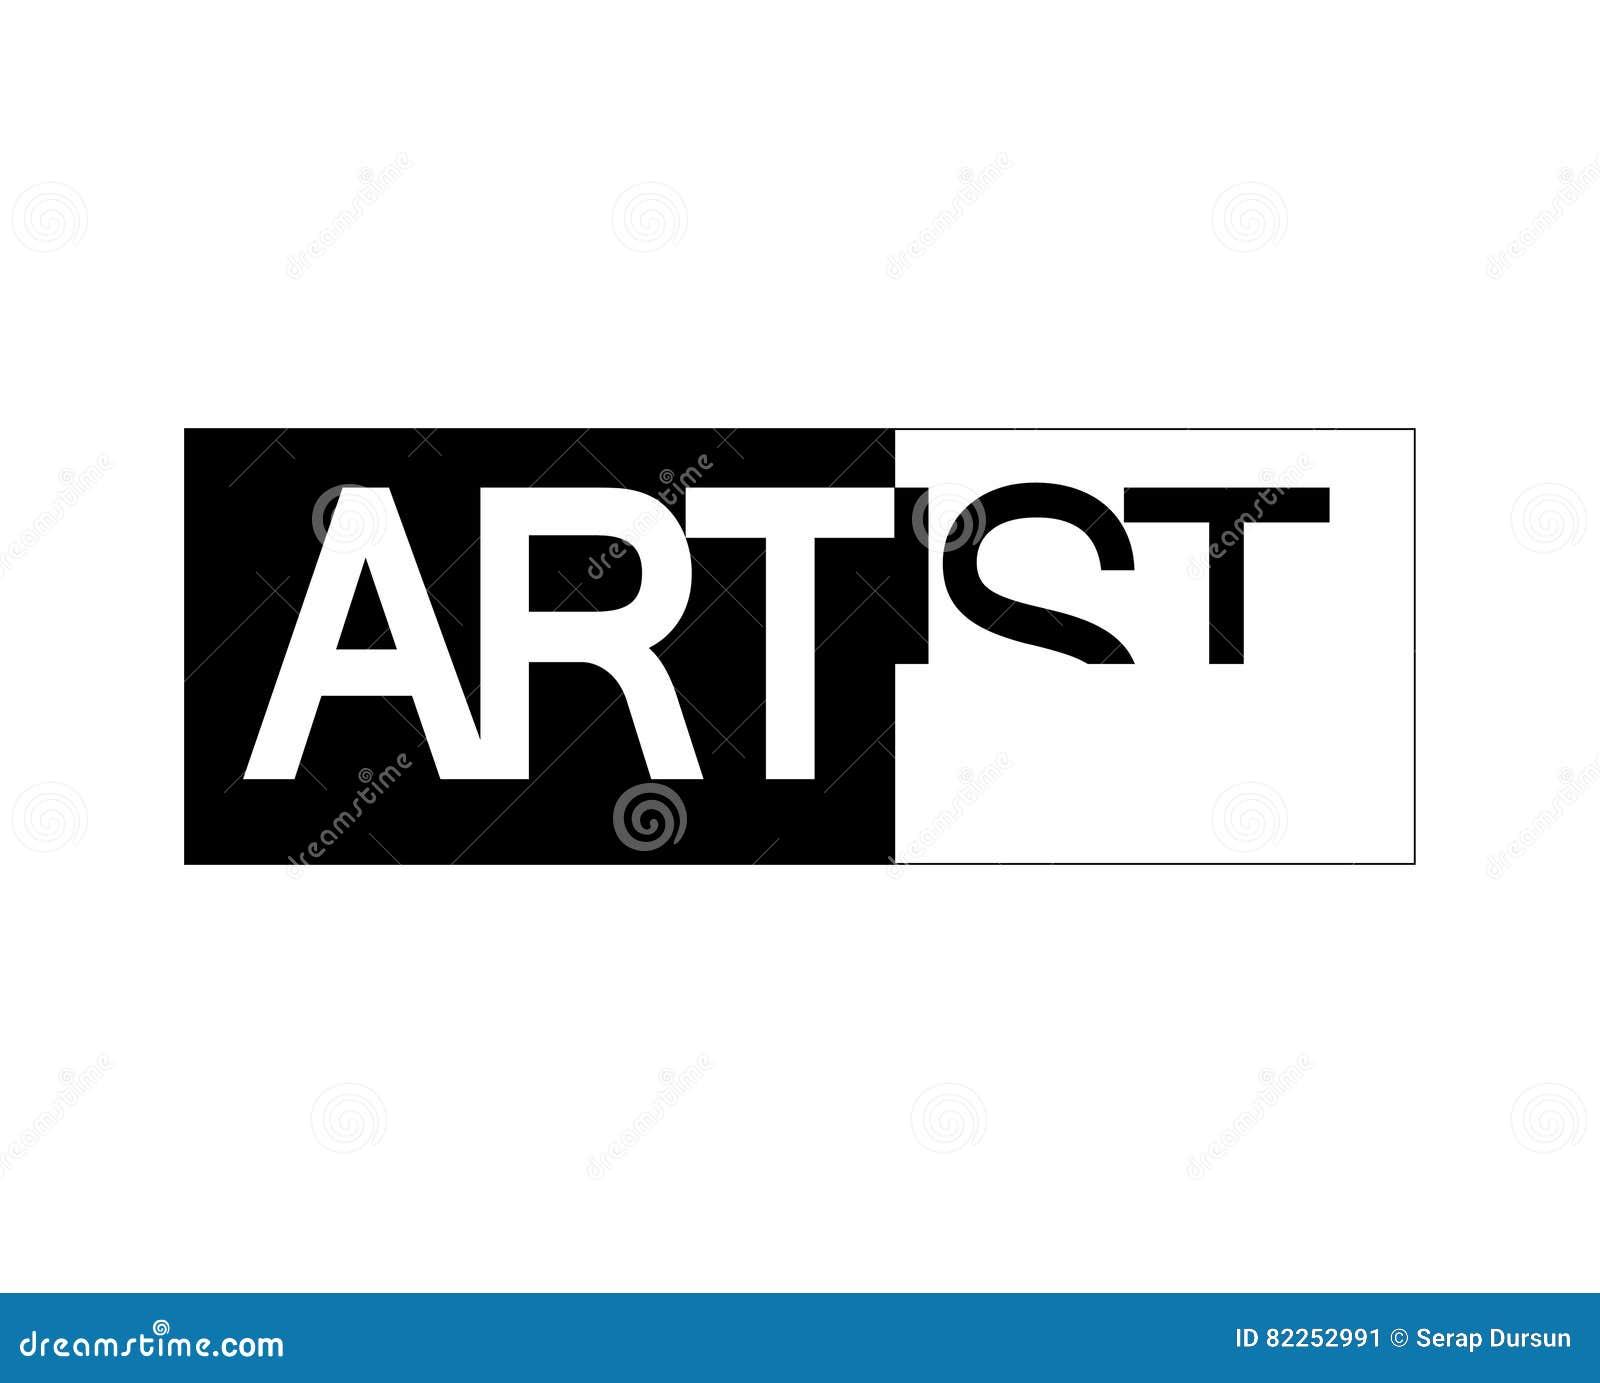 artist logo design stock vector image 82252991